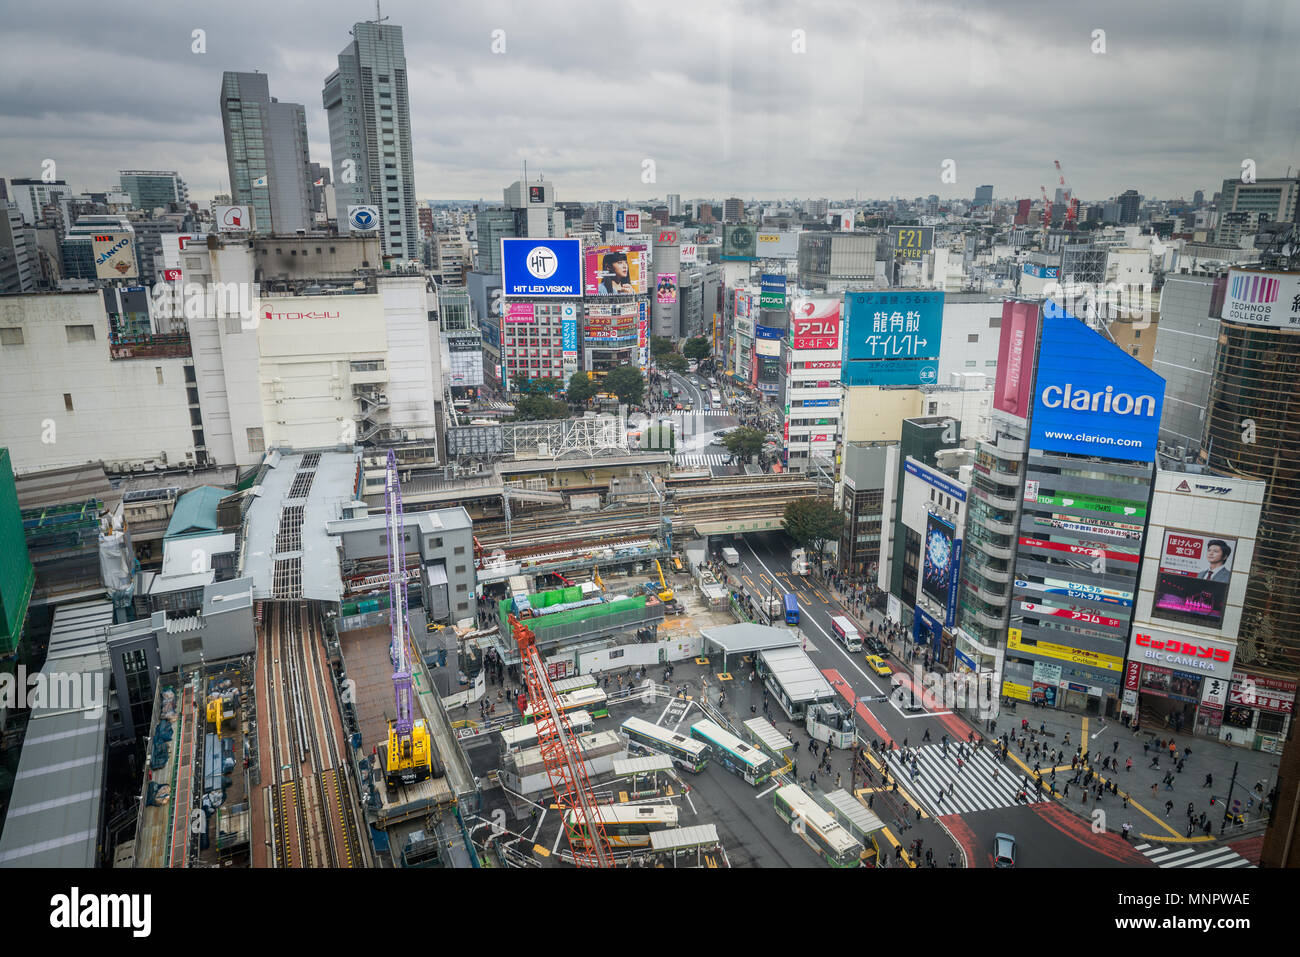 Tokyo, Japan - October 20, 2017: People and traffic at Shibuya Crossing. Scramble crossing in ShibuyaTokyo is famous landmark of Tokyo for nightlife a - Stock Image